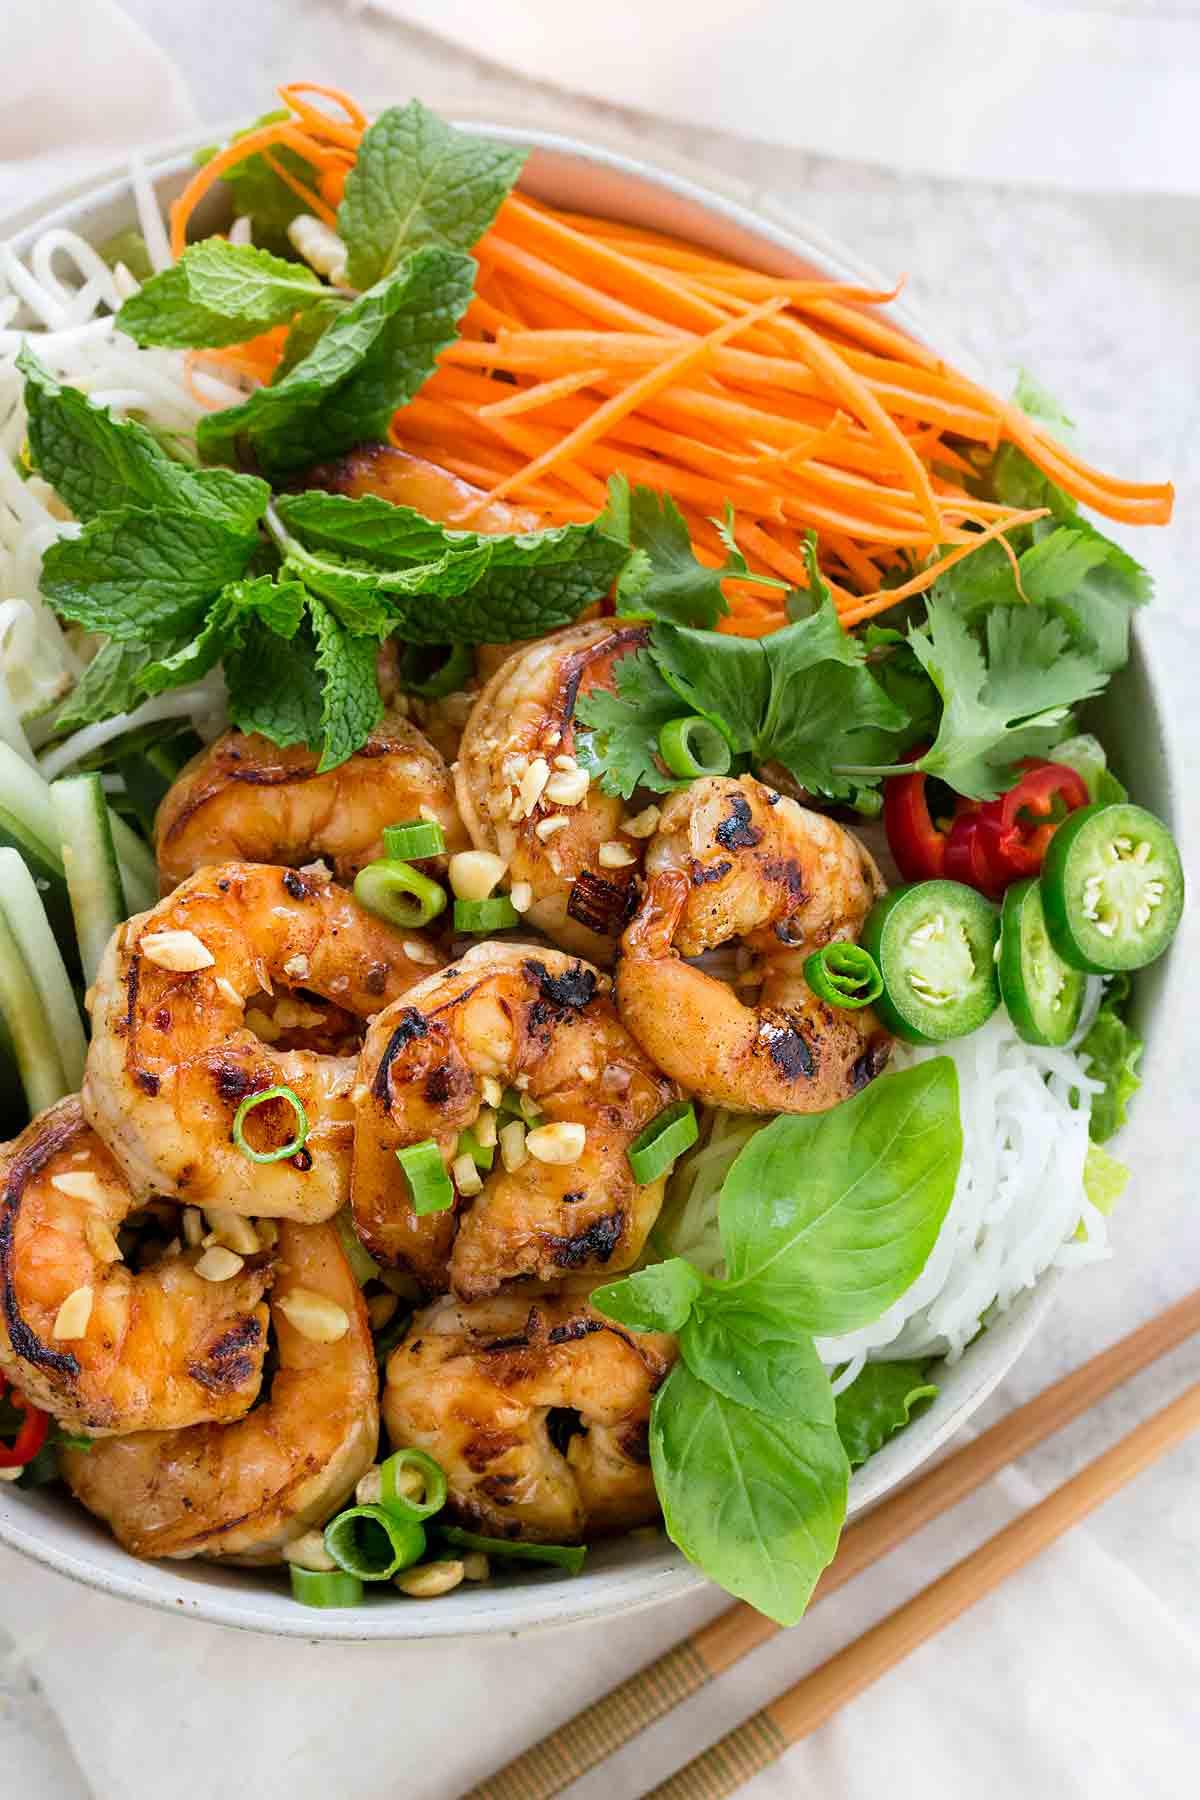 Foto der Schale Shrimpssalat